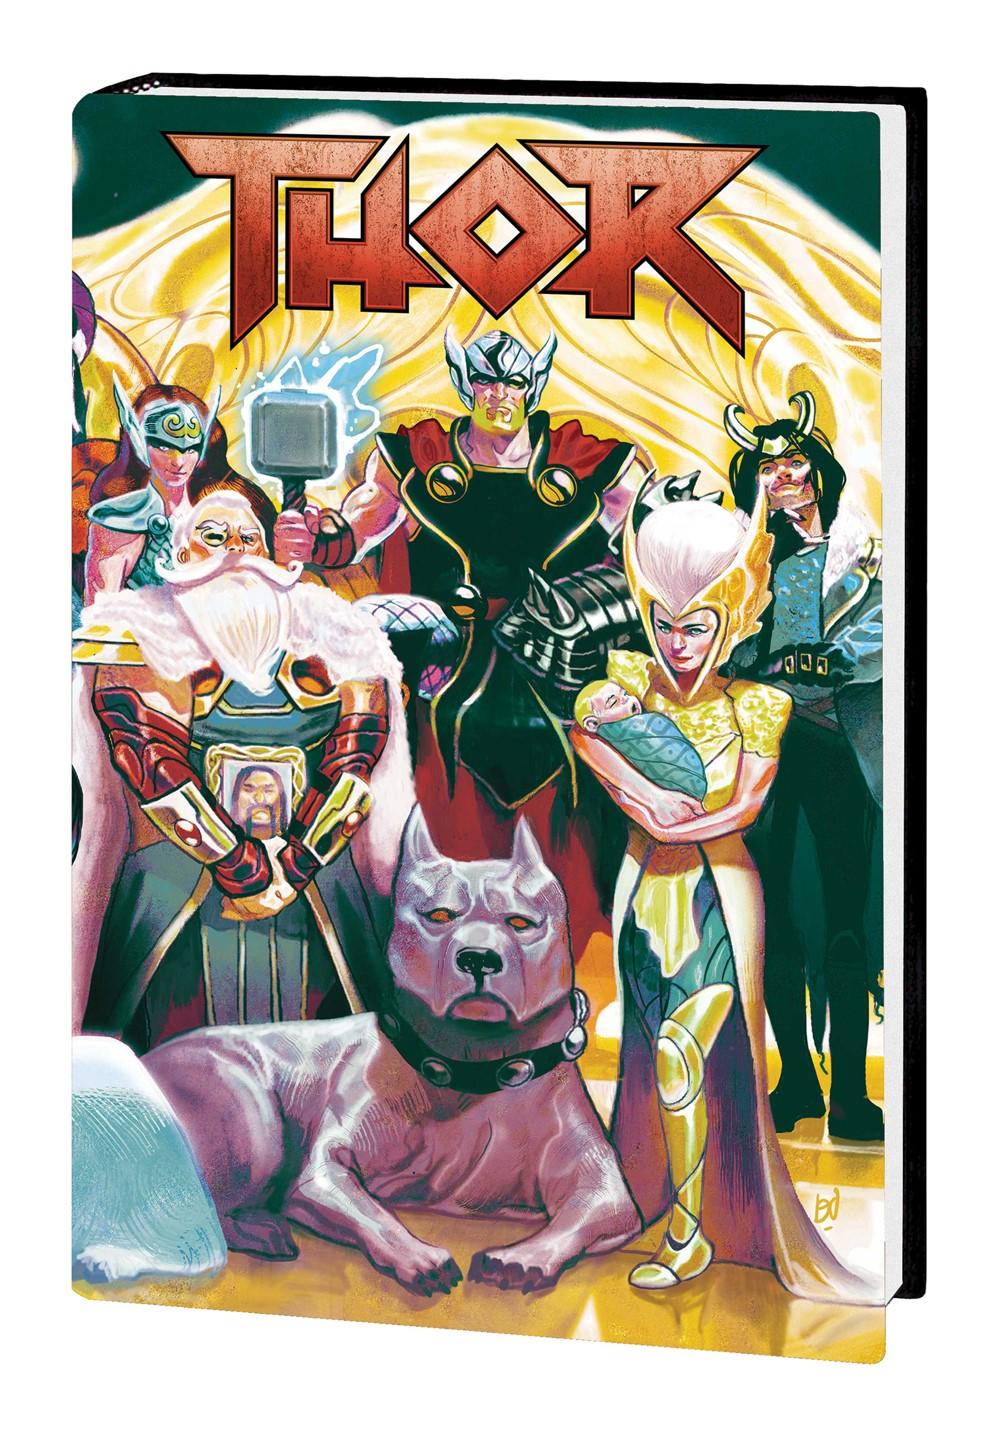 THOR_JA_VOL_5_HC Marvel Comics September 2021 Solicitations